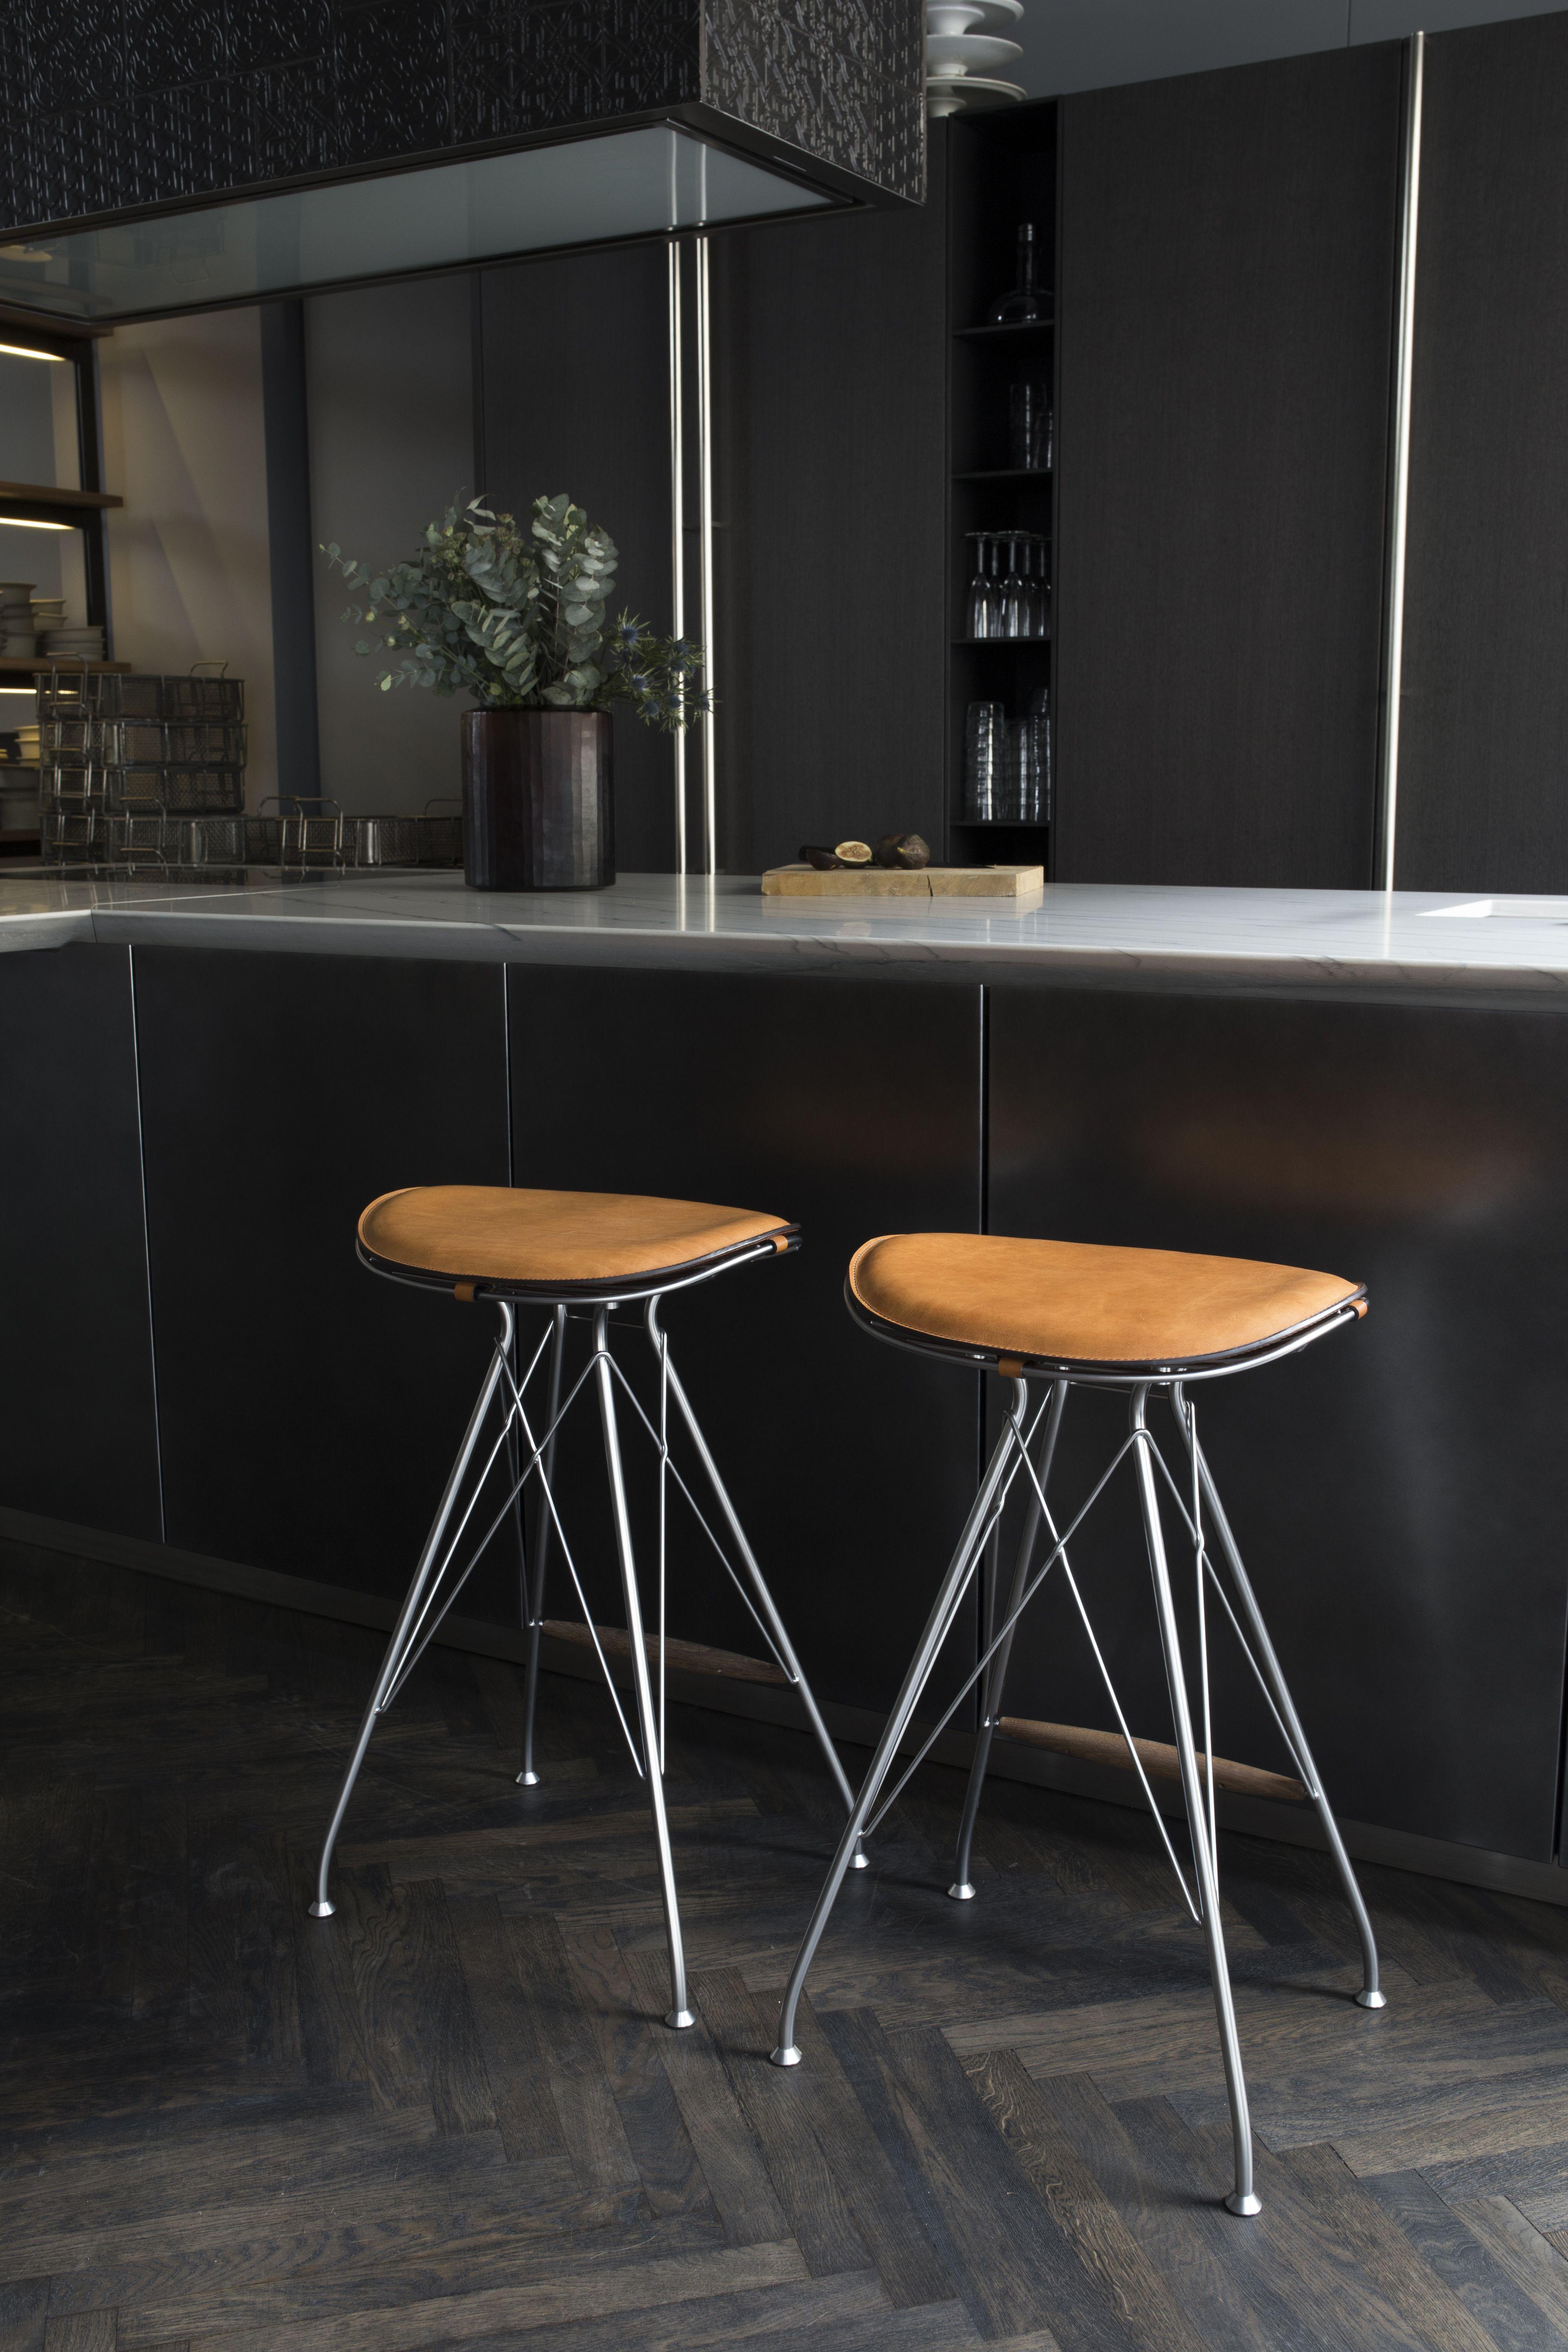 Wire Bar Stool in a Kitchen by Boffi - Overgaard & Dyrman ...